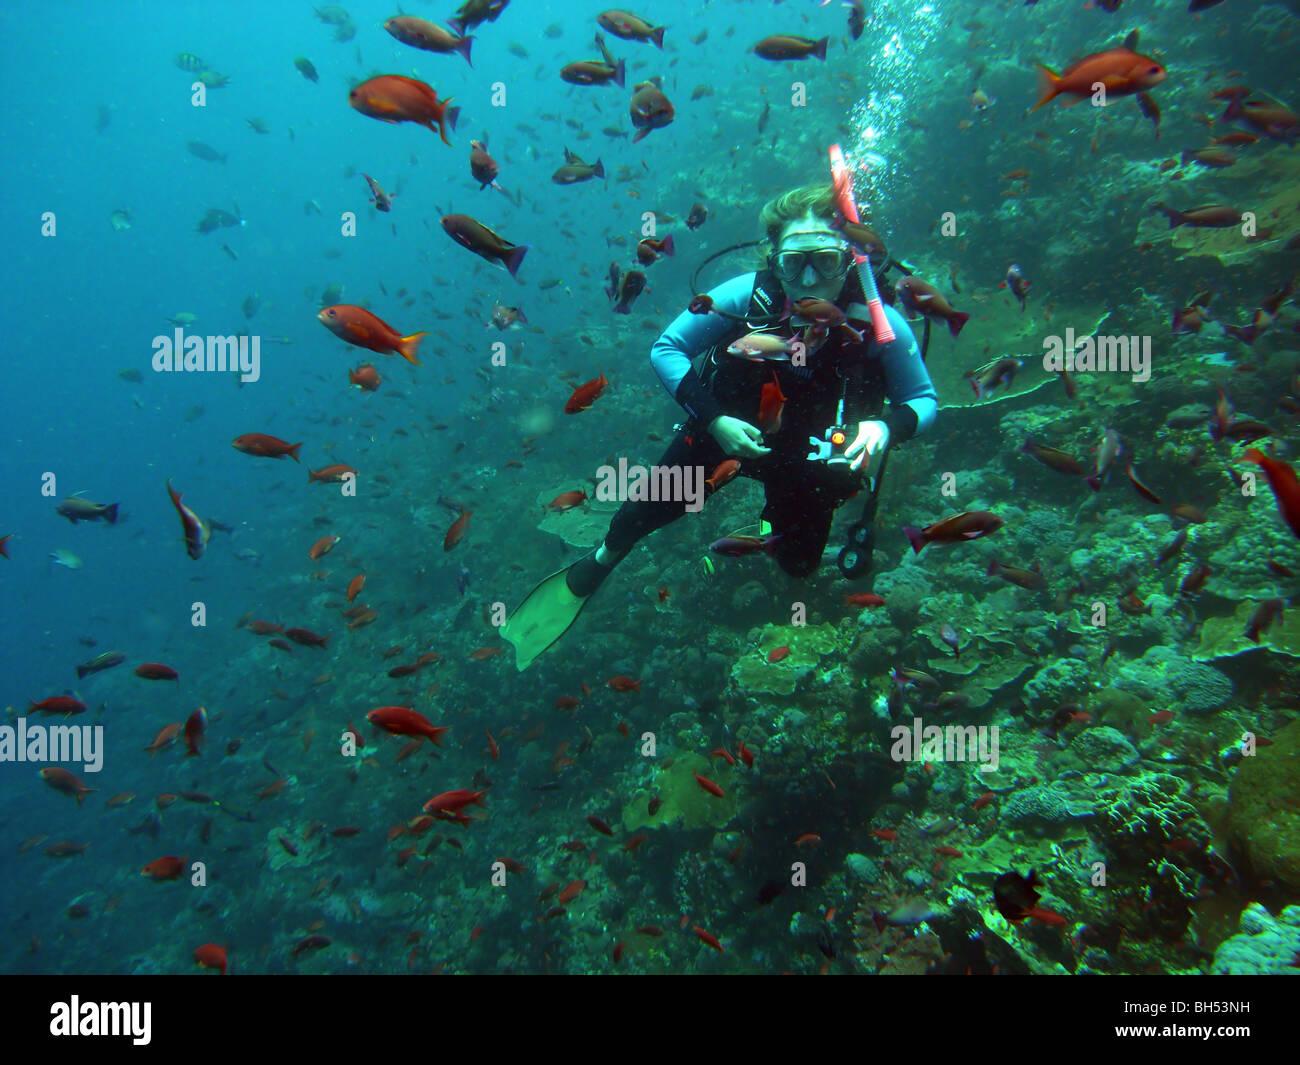 Scuba diver amongst schools of anthias fish, Komodo Marine Park, Indonesia. No MR or PR Stock Photo